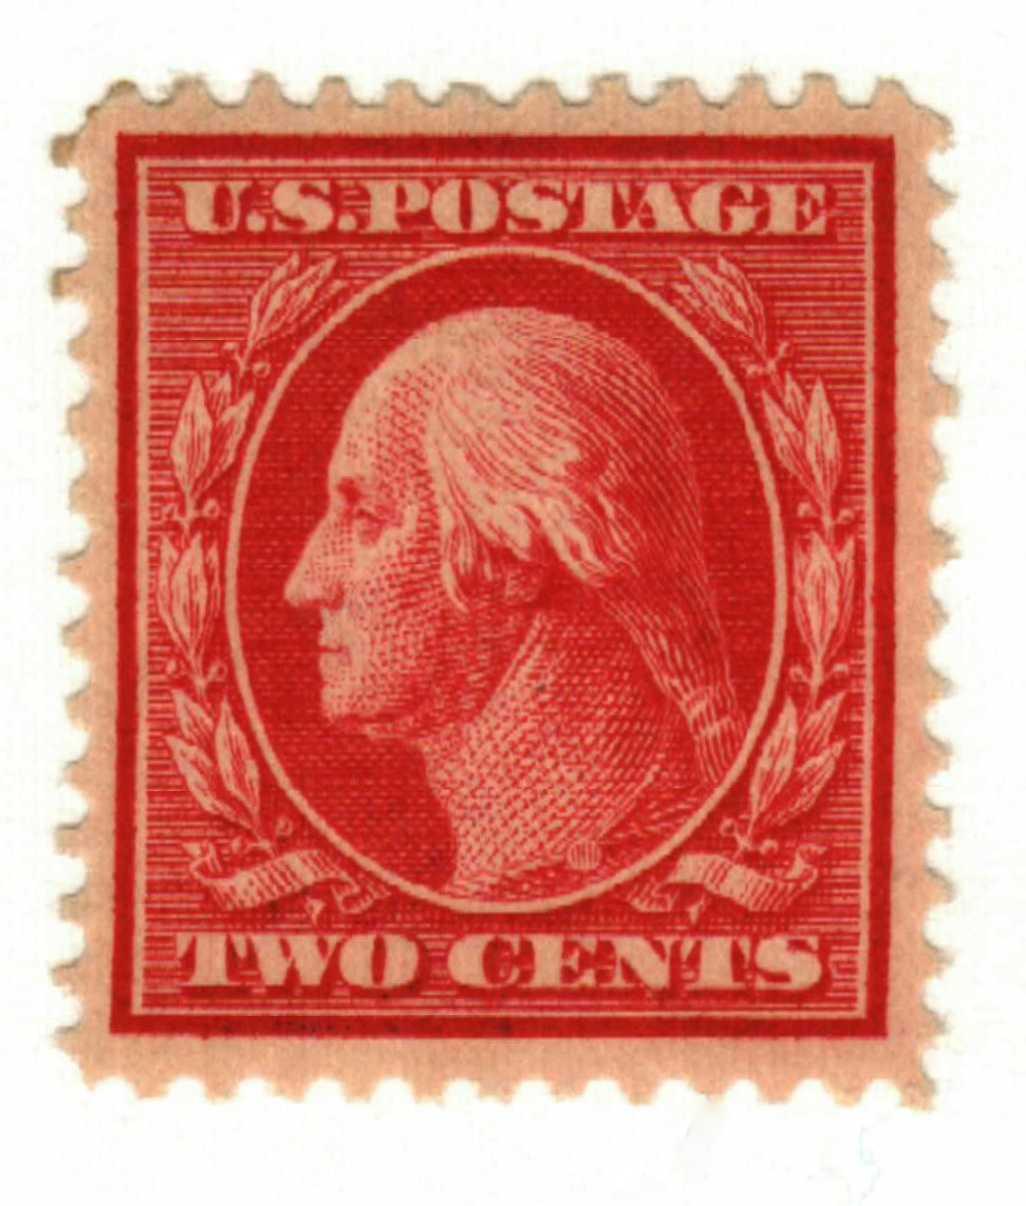 1908 2c Washington, double line watermark